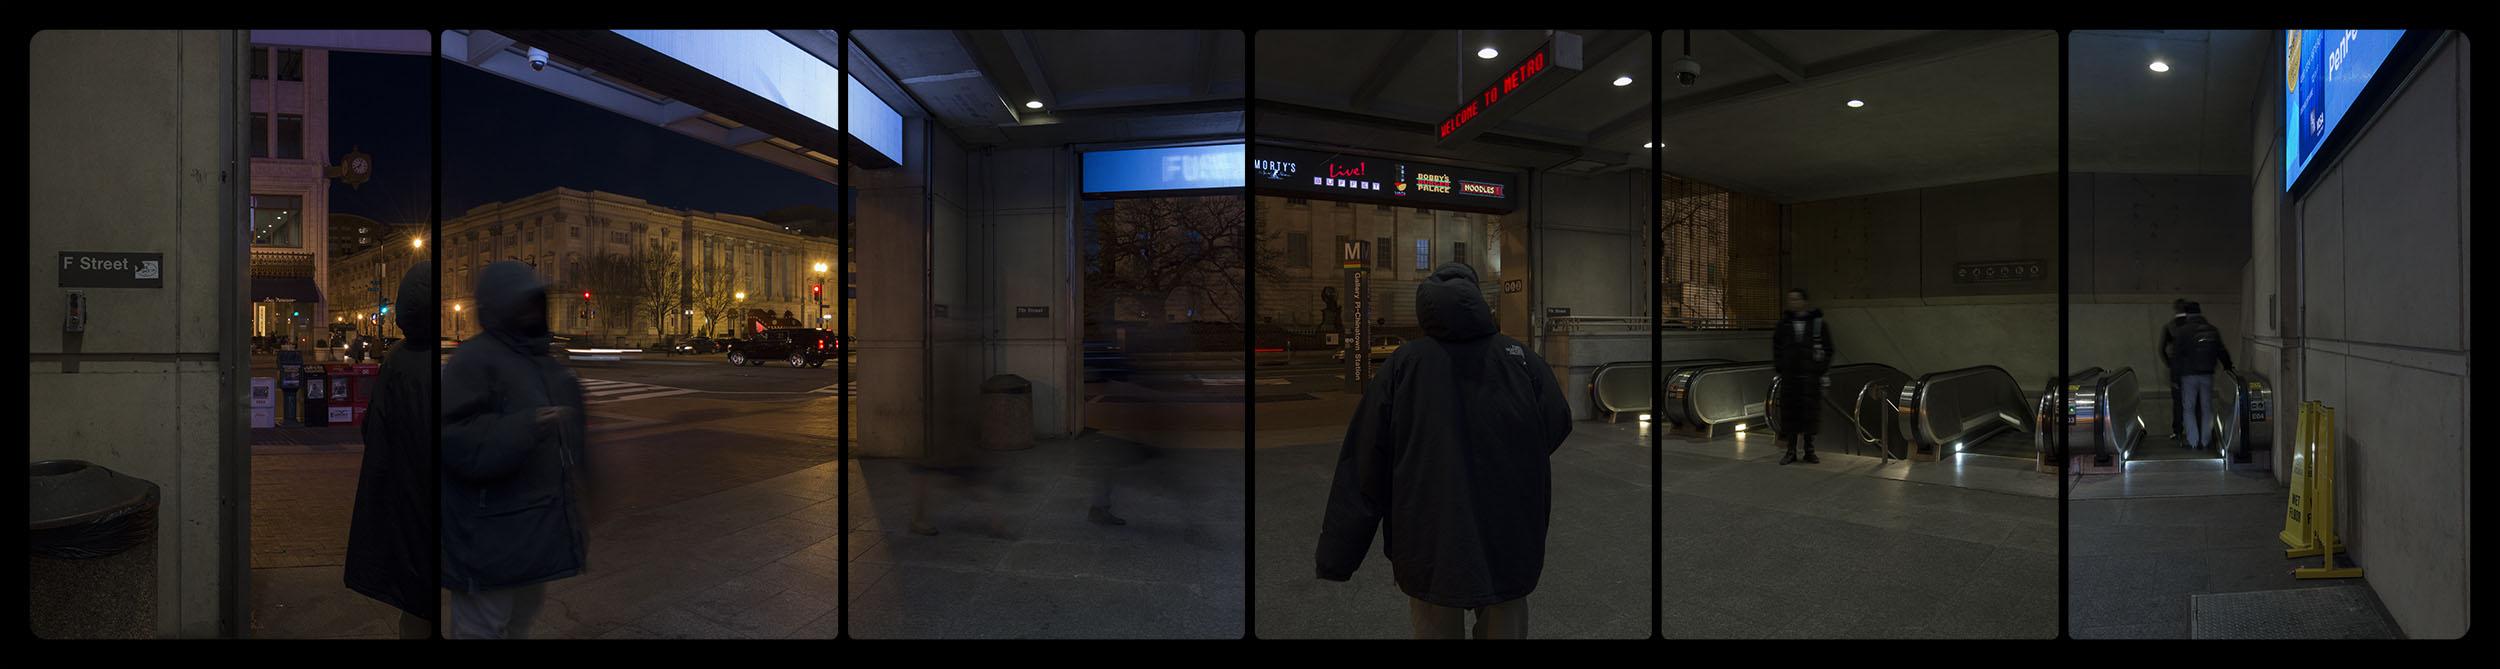 Metro Rail, Gallery Place-Chinatown, 3-24-2015-5351-5361